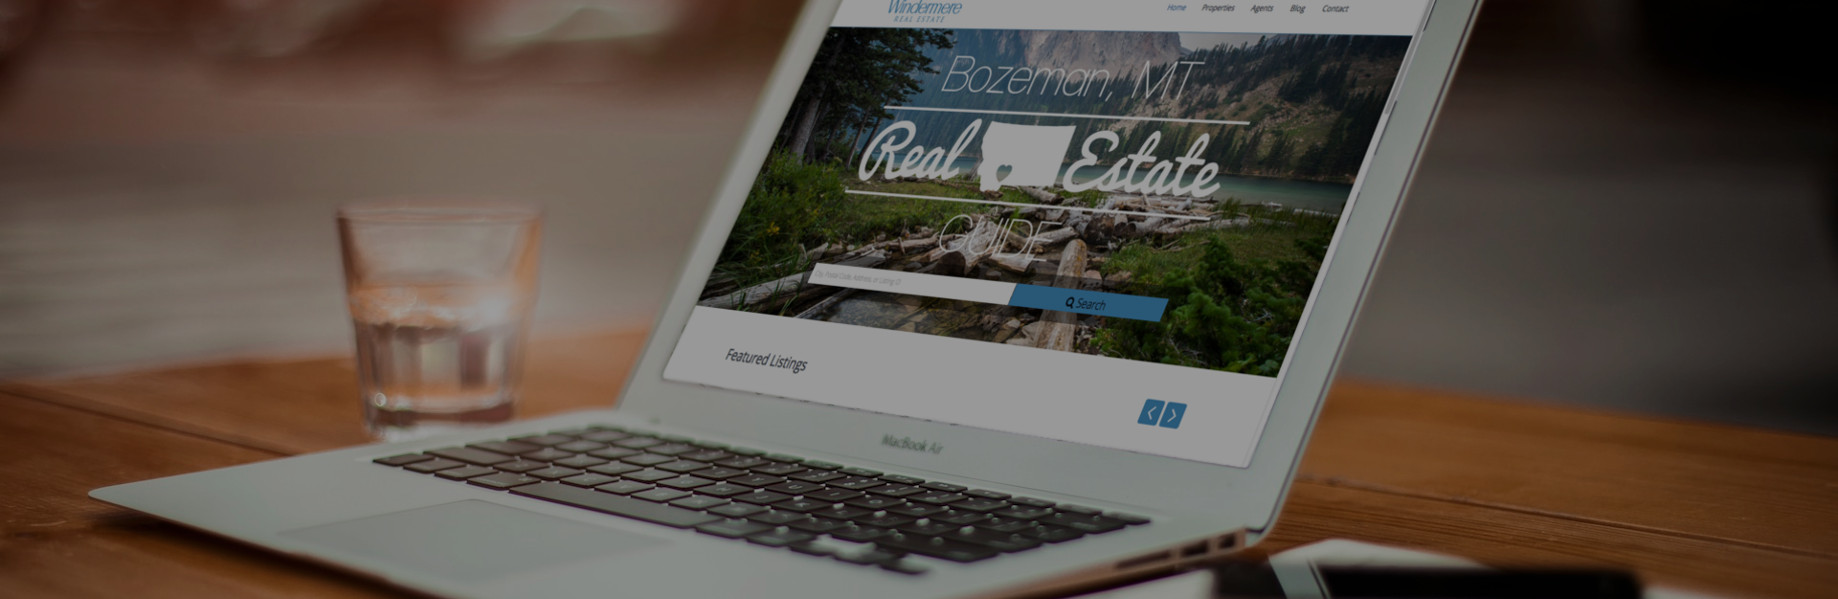 Internet Marketing Services | Website Design | SEO | Branding Iron Marketing, LLC | Bozeman, MT